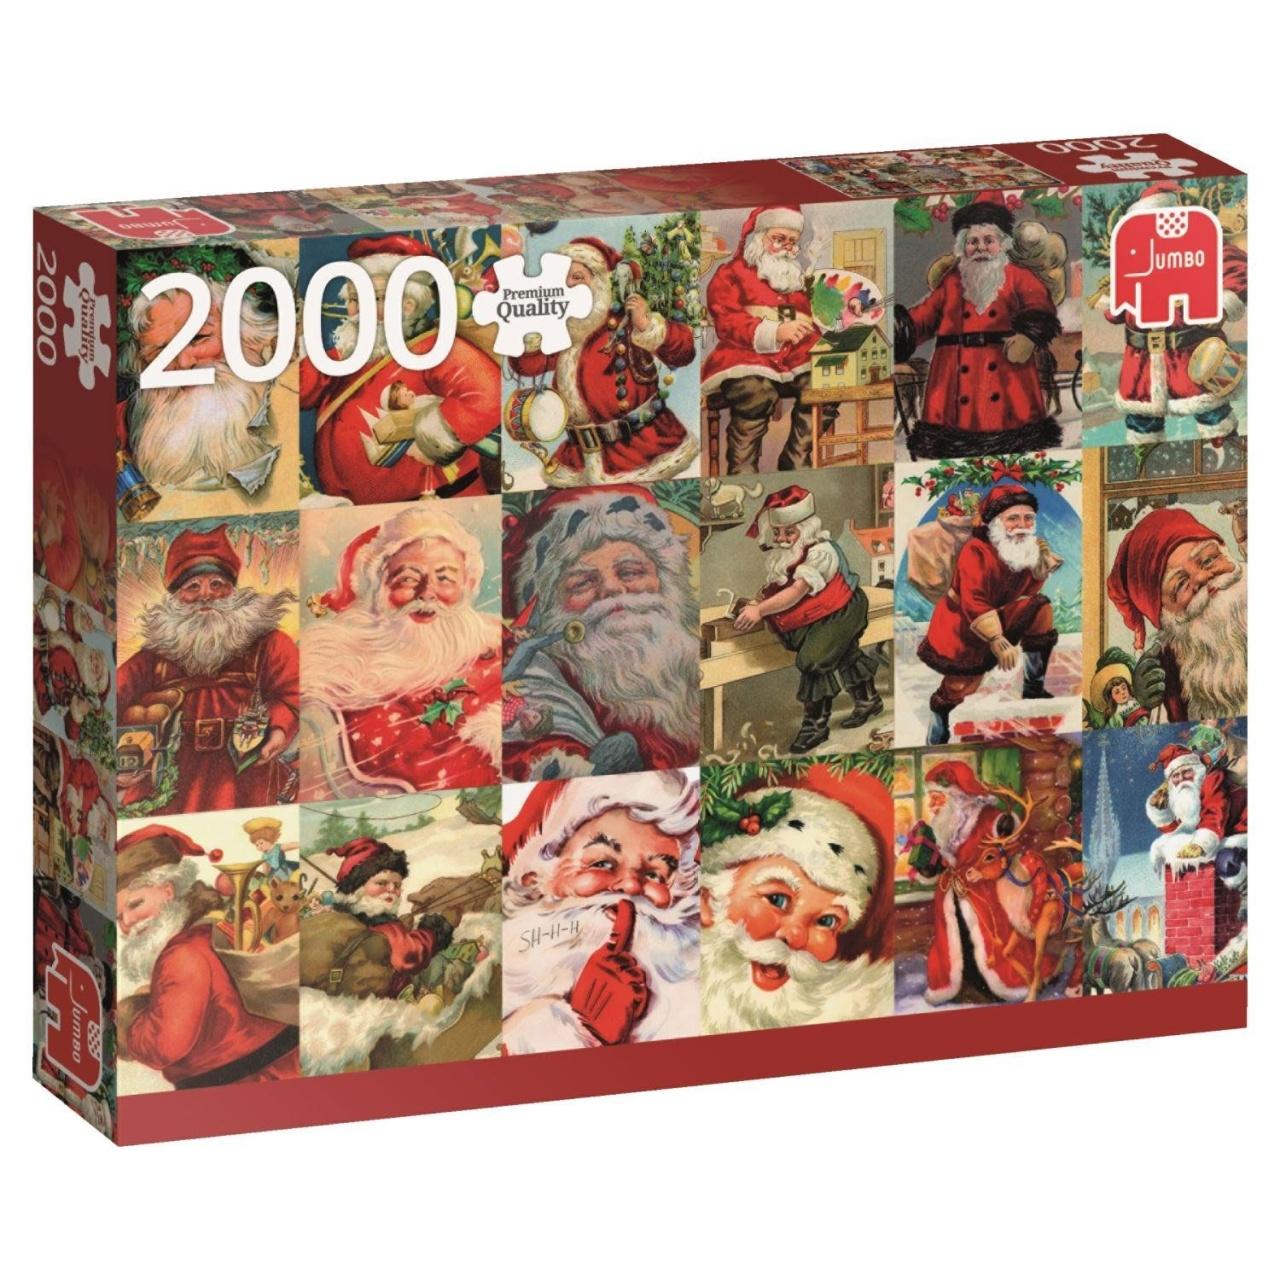 Jumbo Puzzle Weihnachtspuzzle Weihnachtsmänner Vintage